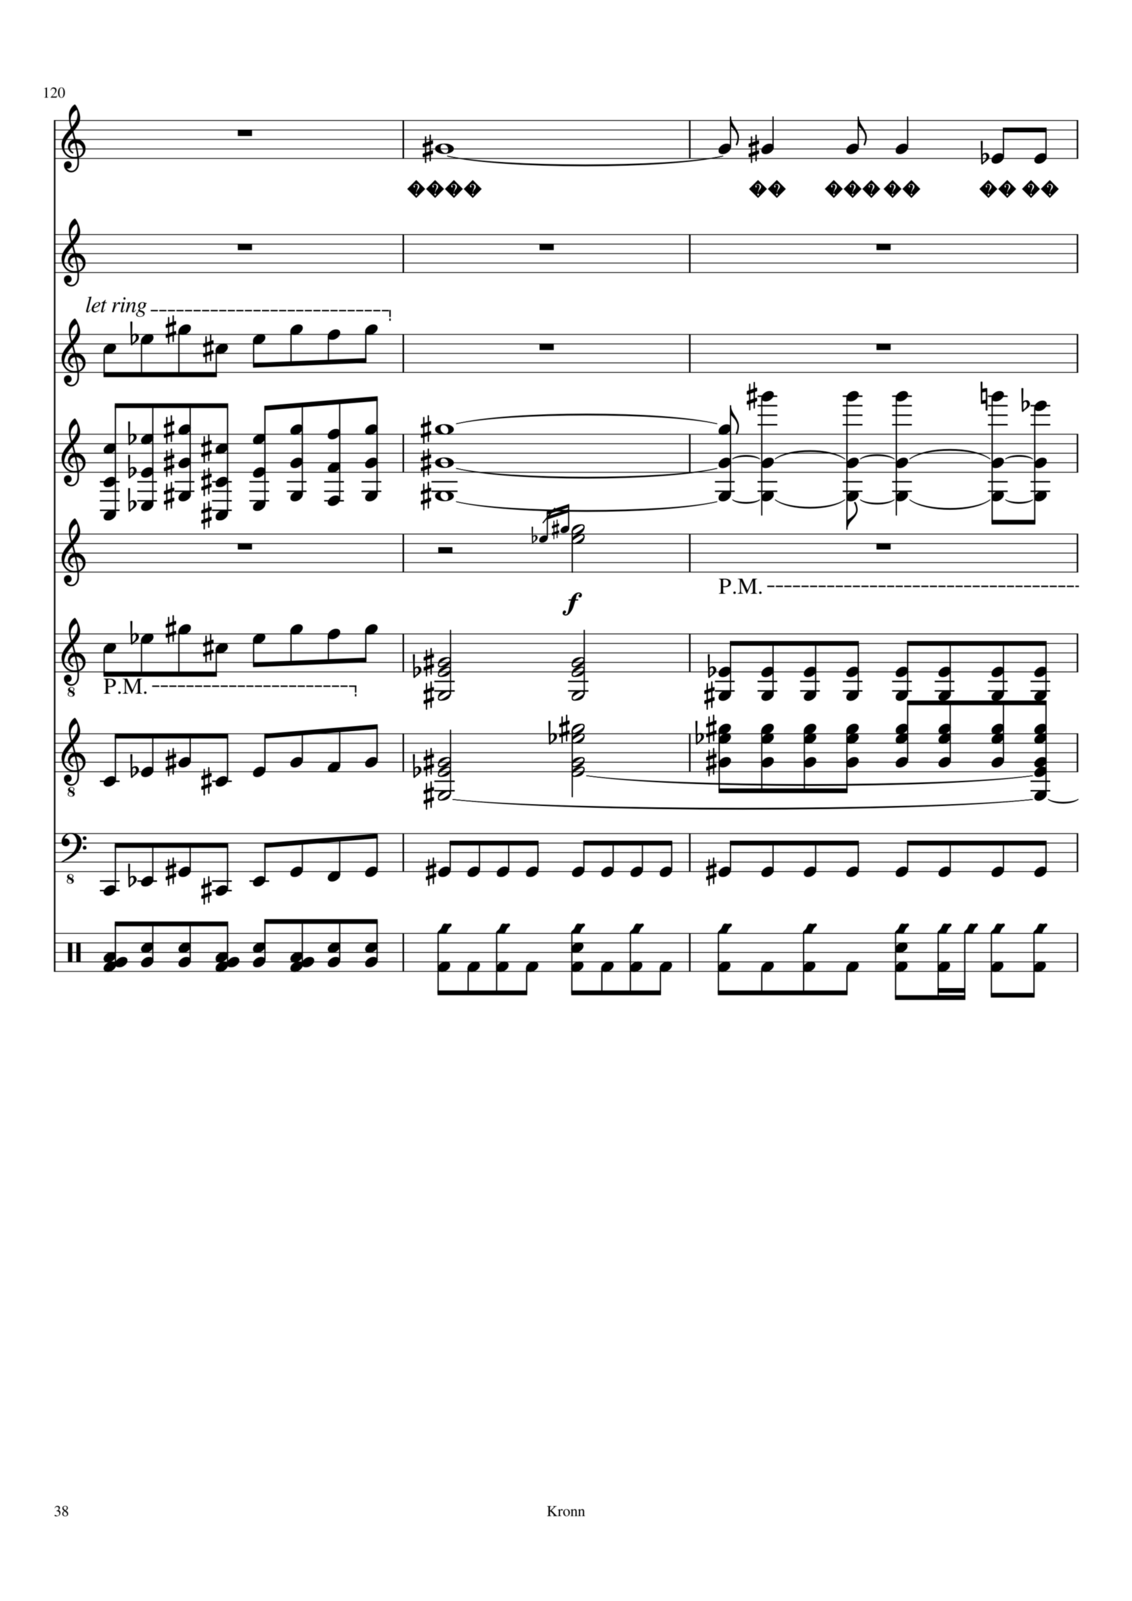 Okean Pustotyi slide, Image 38